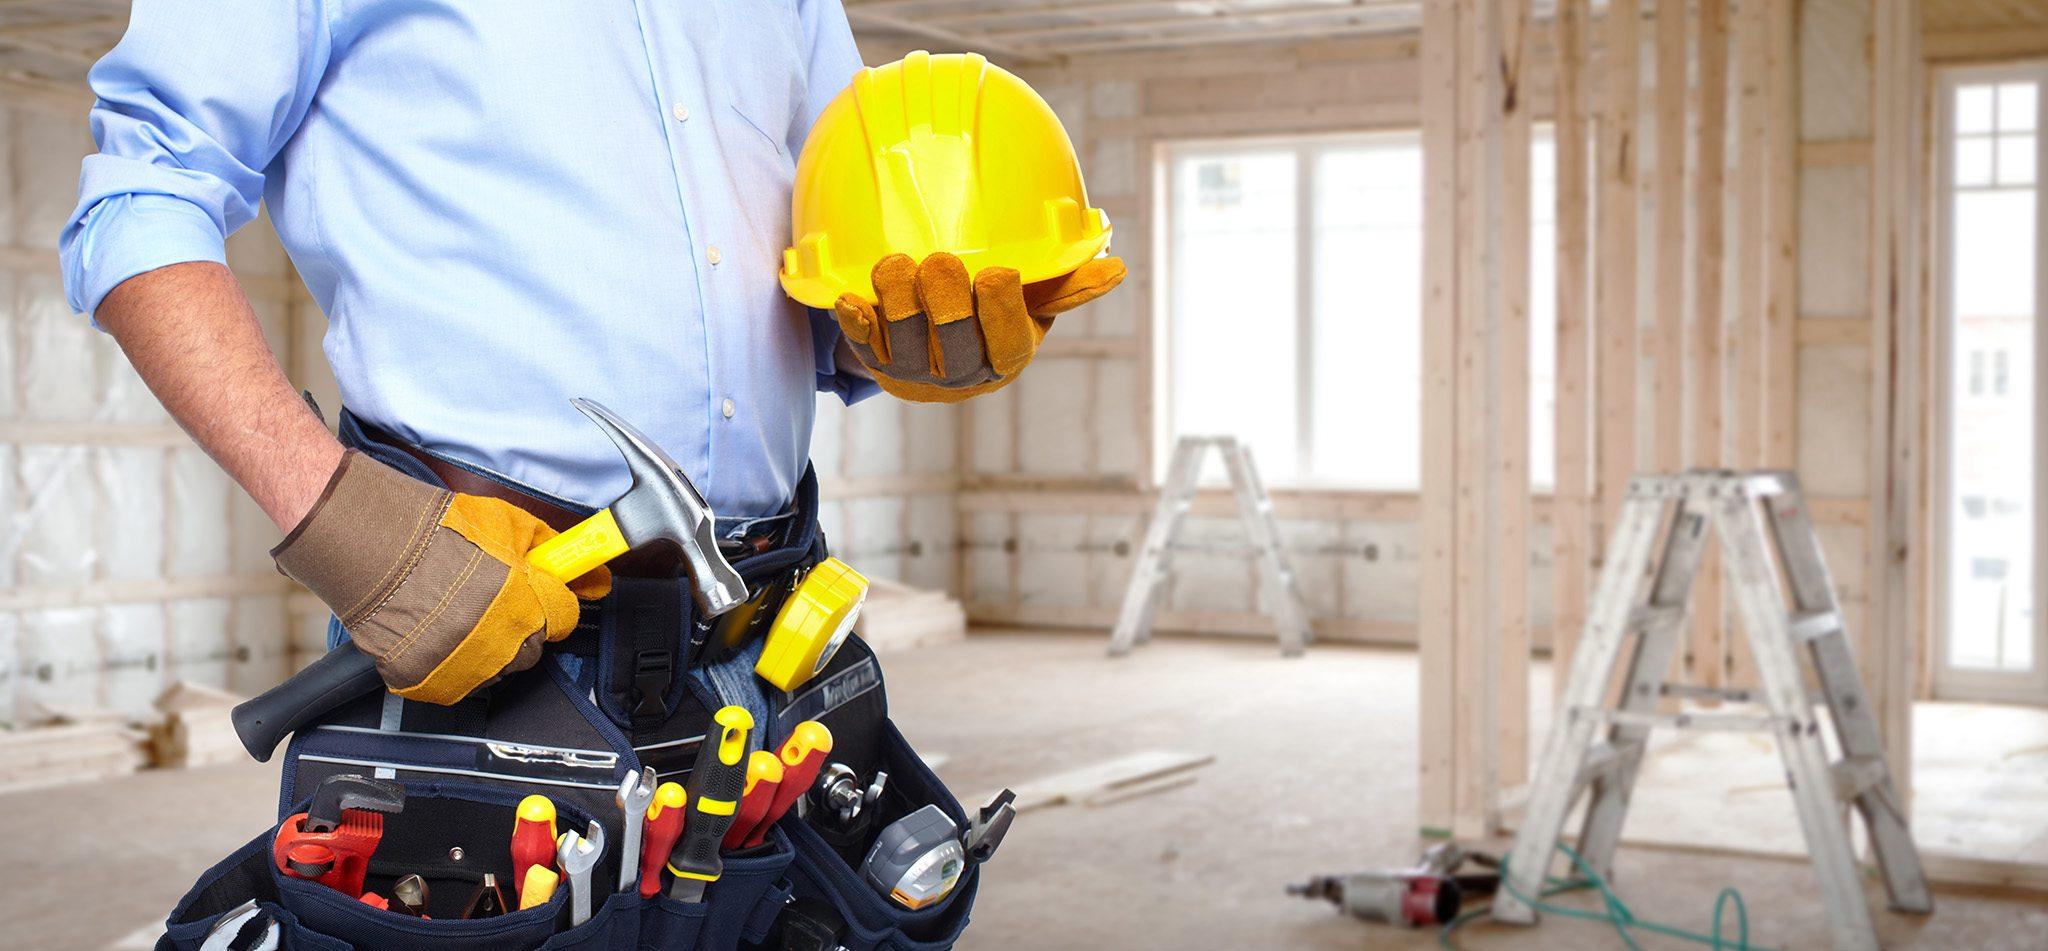 Hire Local Handyman In Pensacola, Fl For Hot Tub Installation